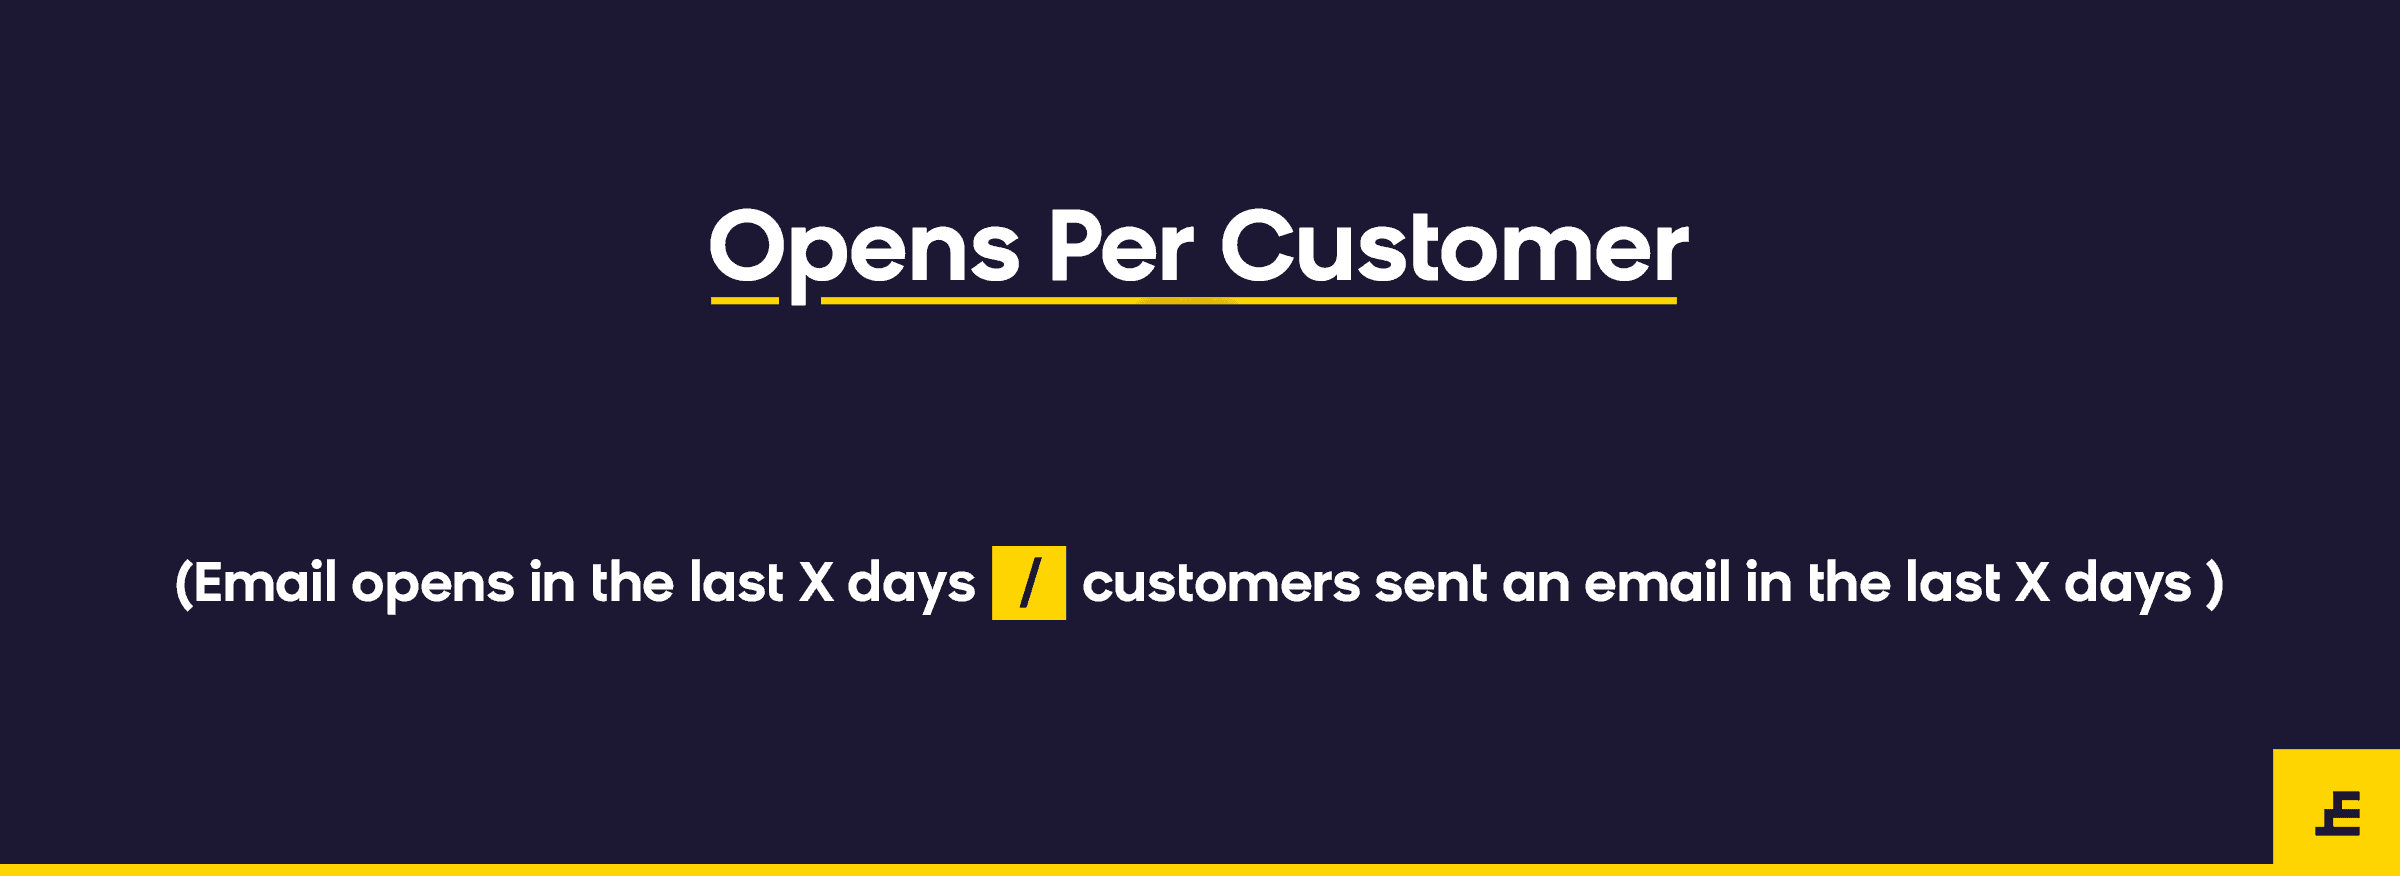 email marketing metric - opens per customer